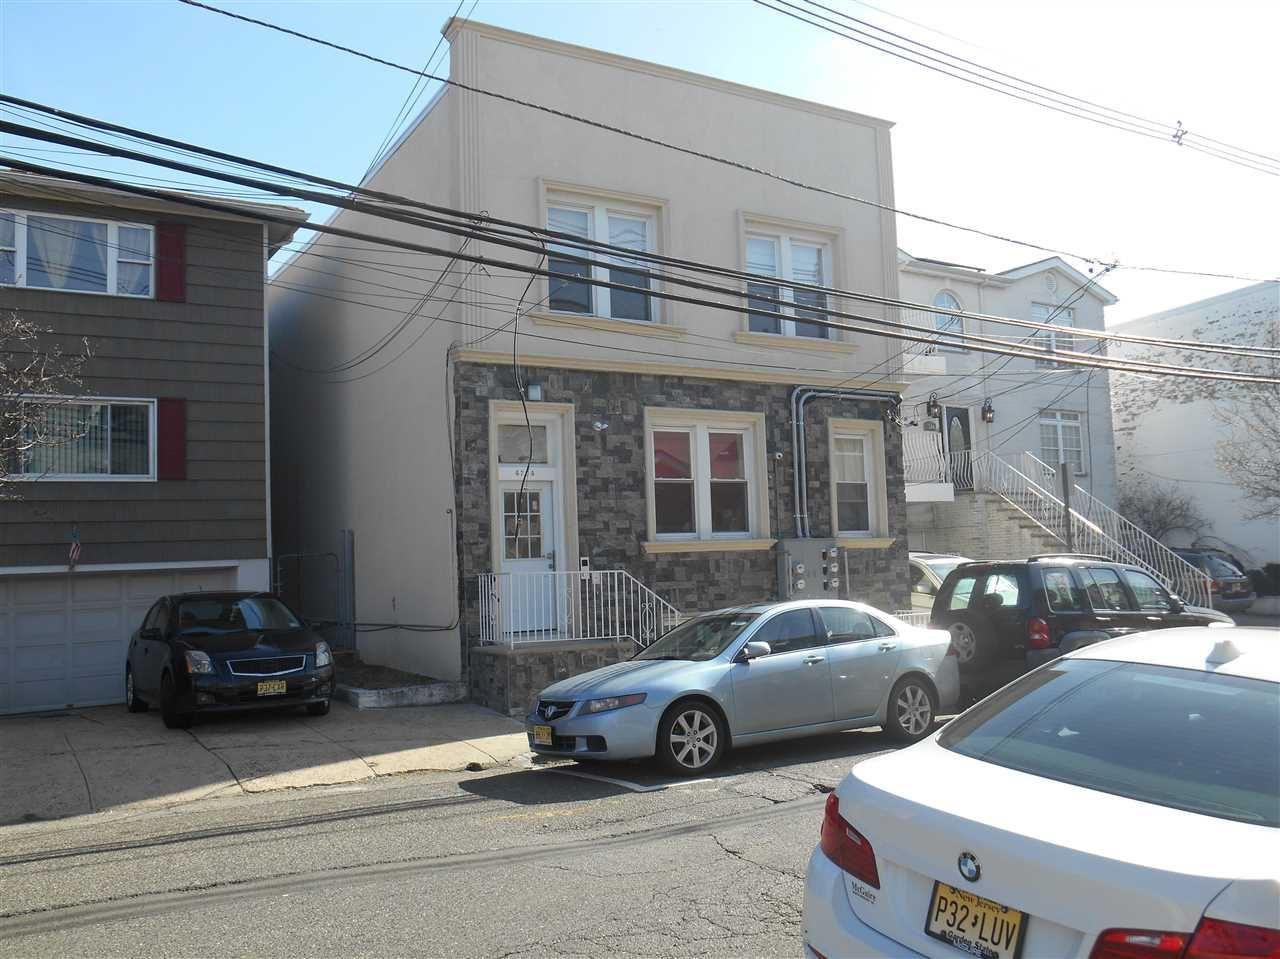 4704 GRAND AVE, North Bergen, NJ 07047 - MLS#: 202003835